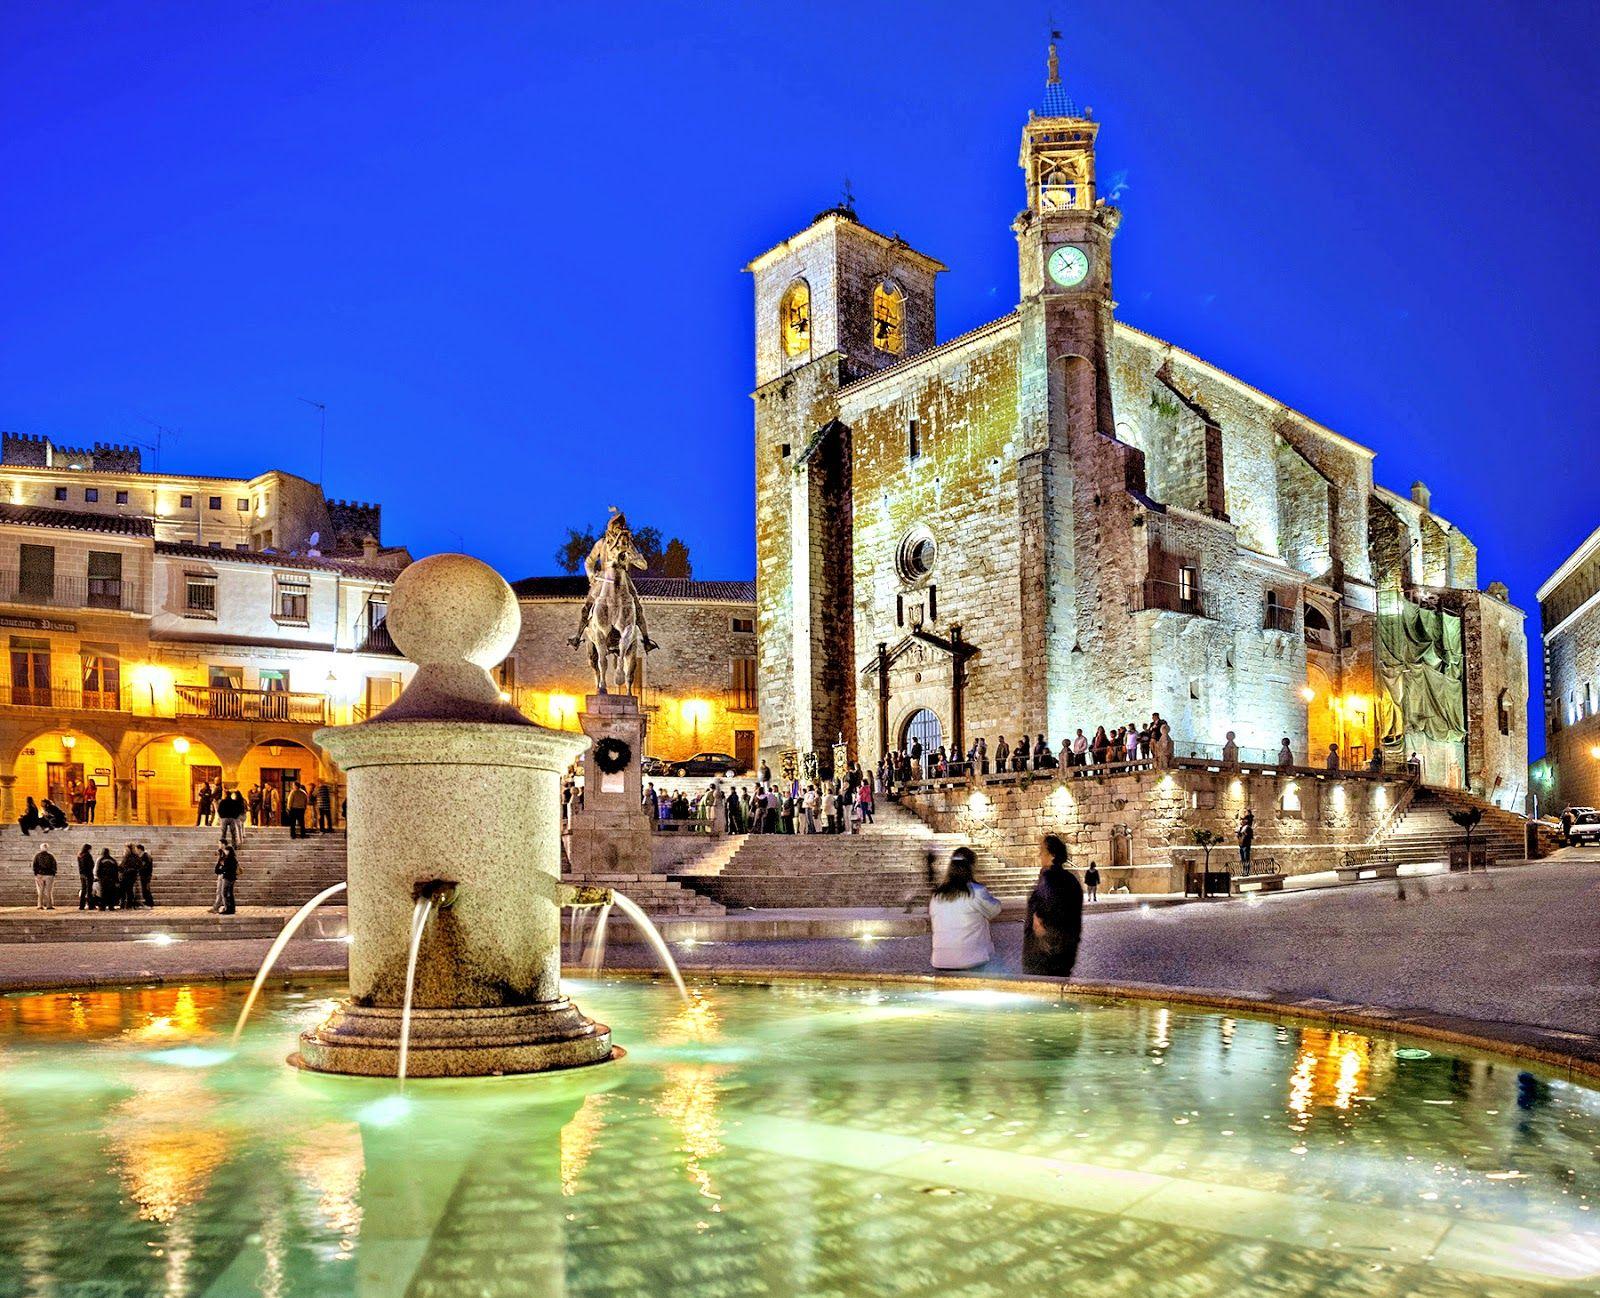 Destinos con Historia: Extremadura de pata negra !!!